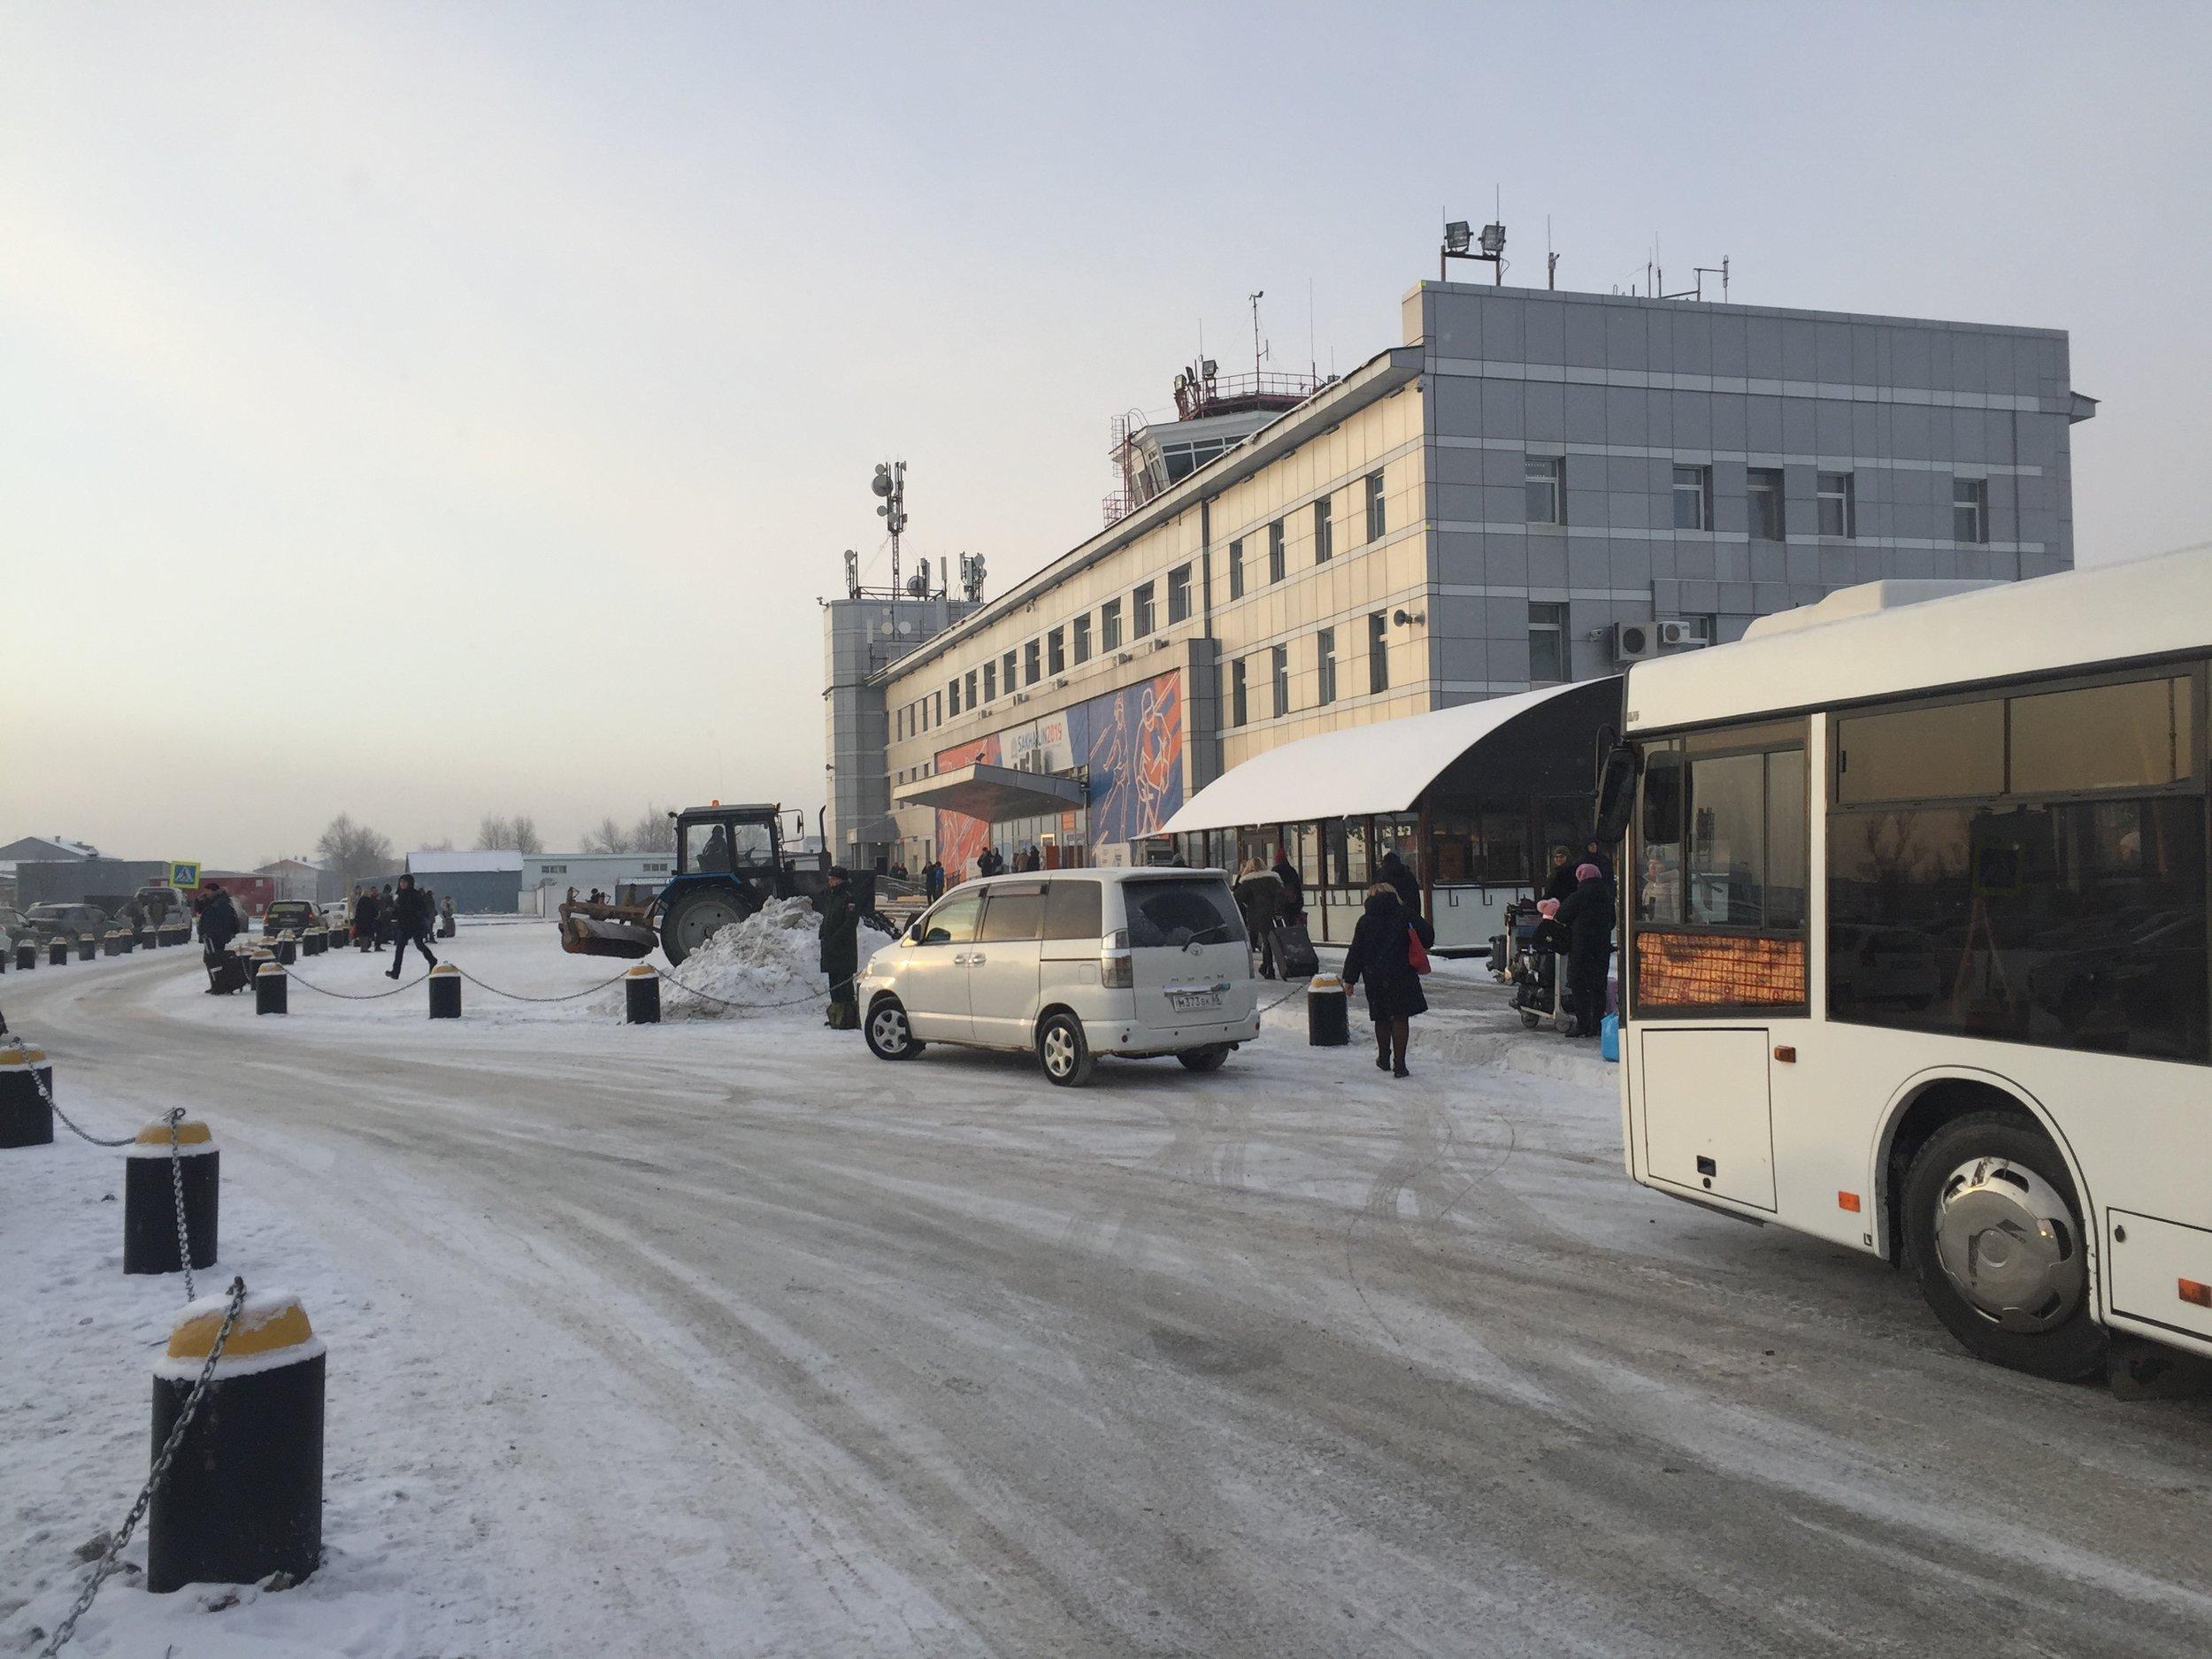 yuzhno-sakhalinsk airport.JPG